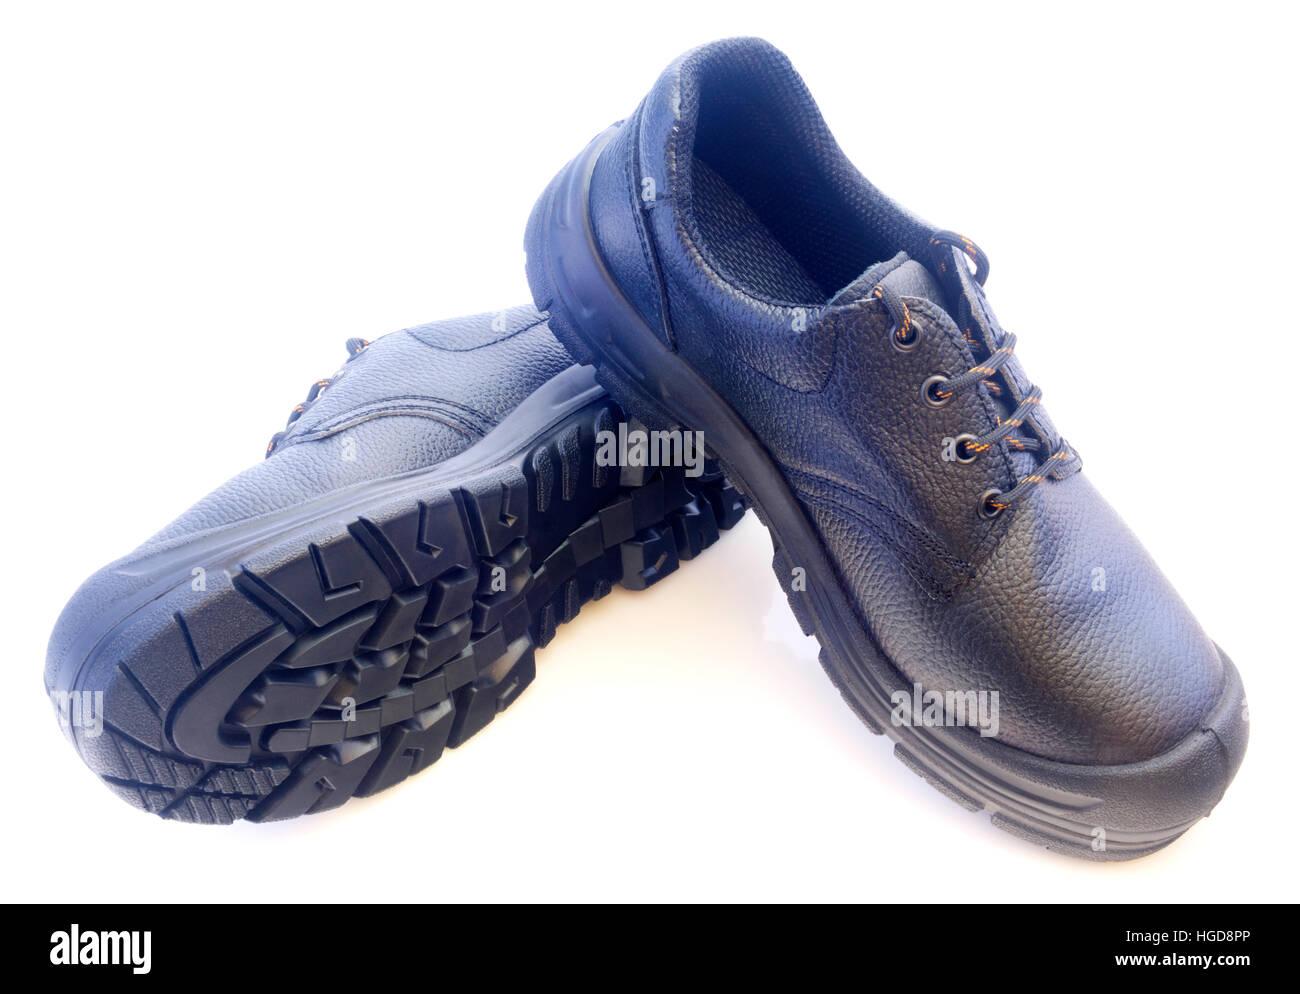 New black mans leather shoes isolated on white background - Stock Image